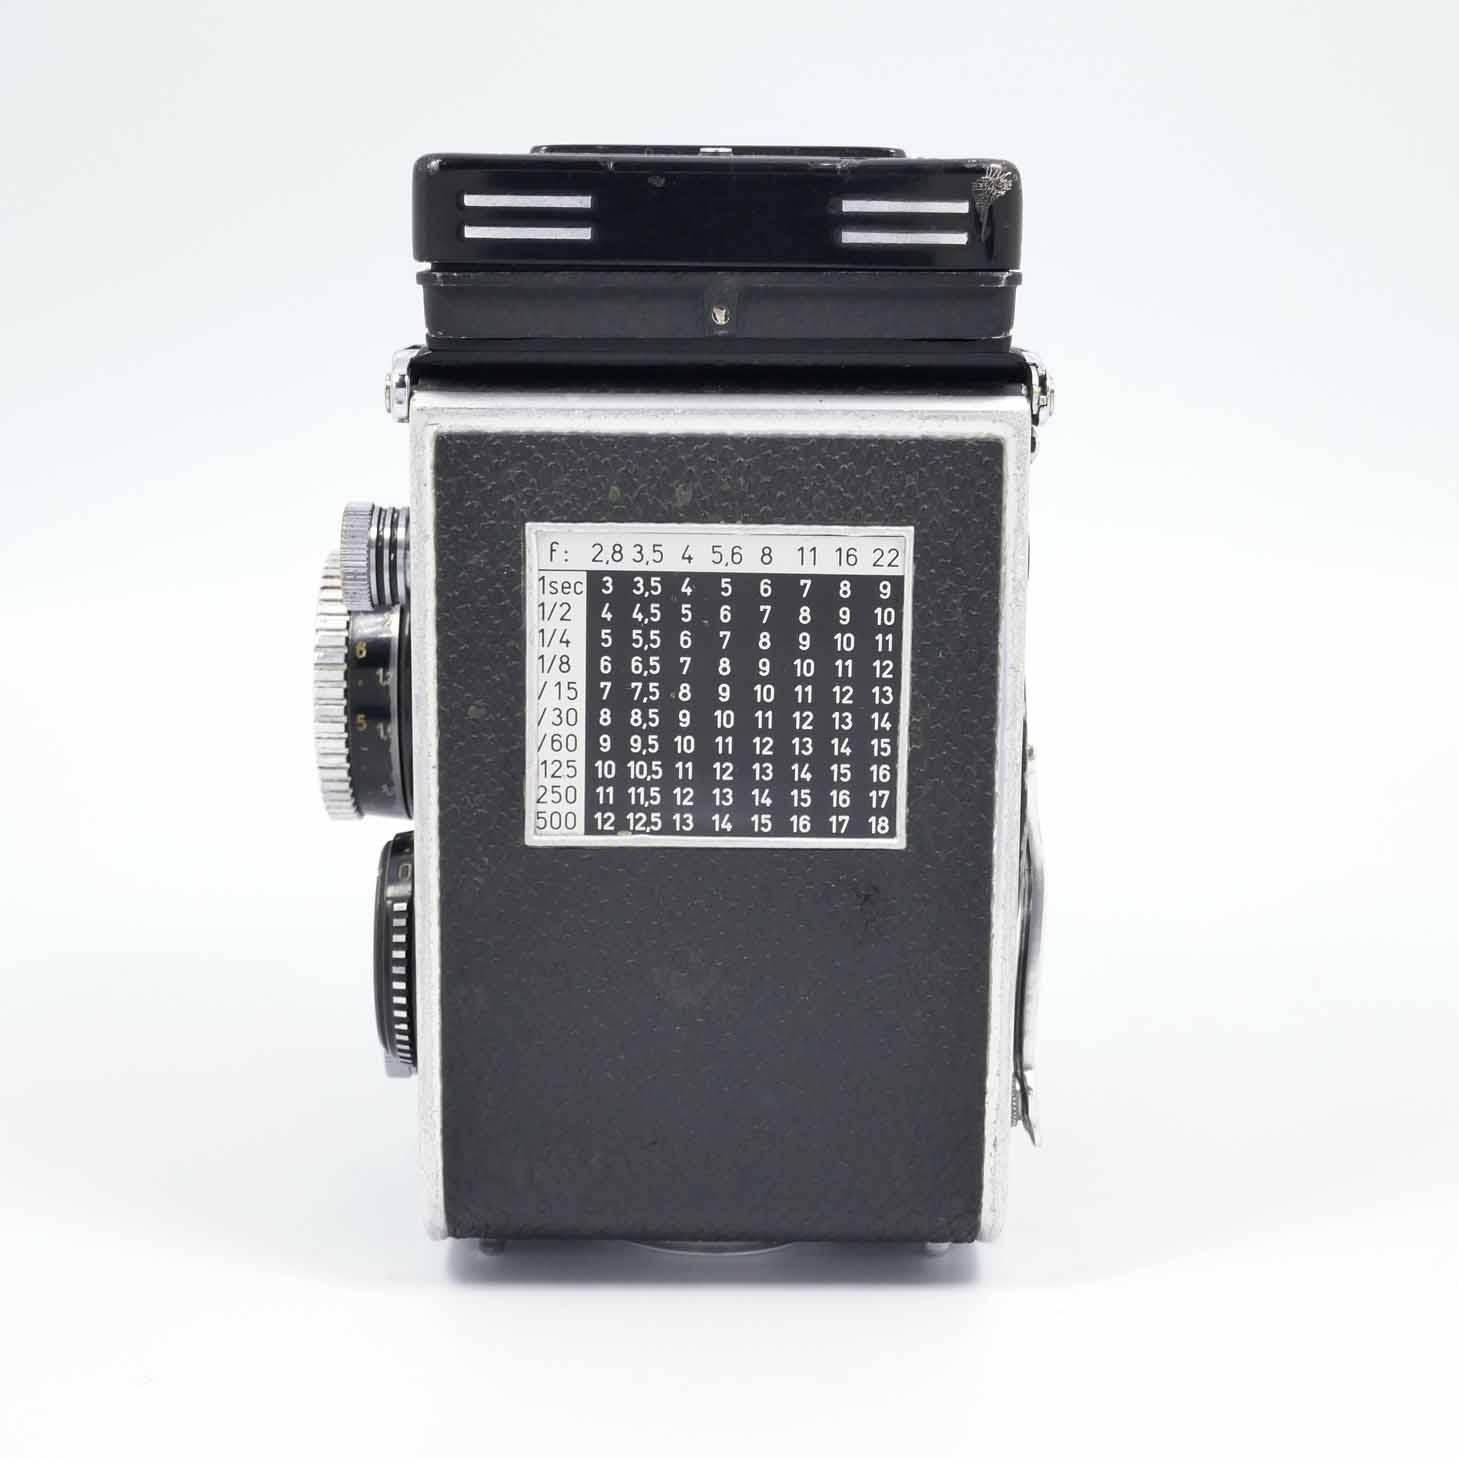 clean-cameras-Rolleiflex-2.8-F10